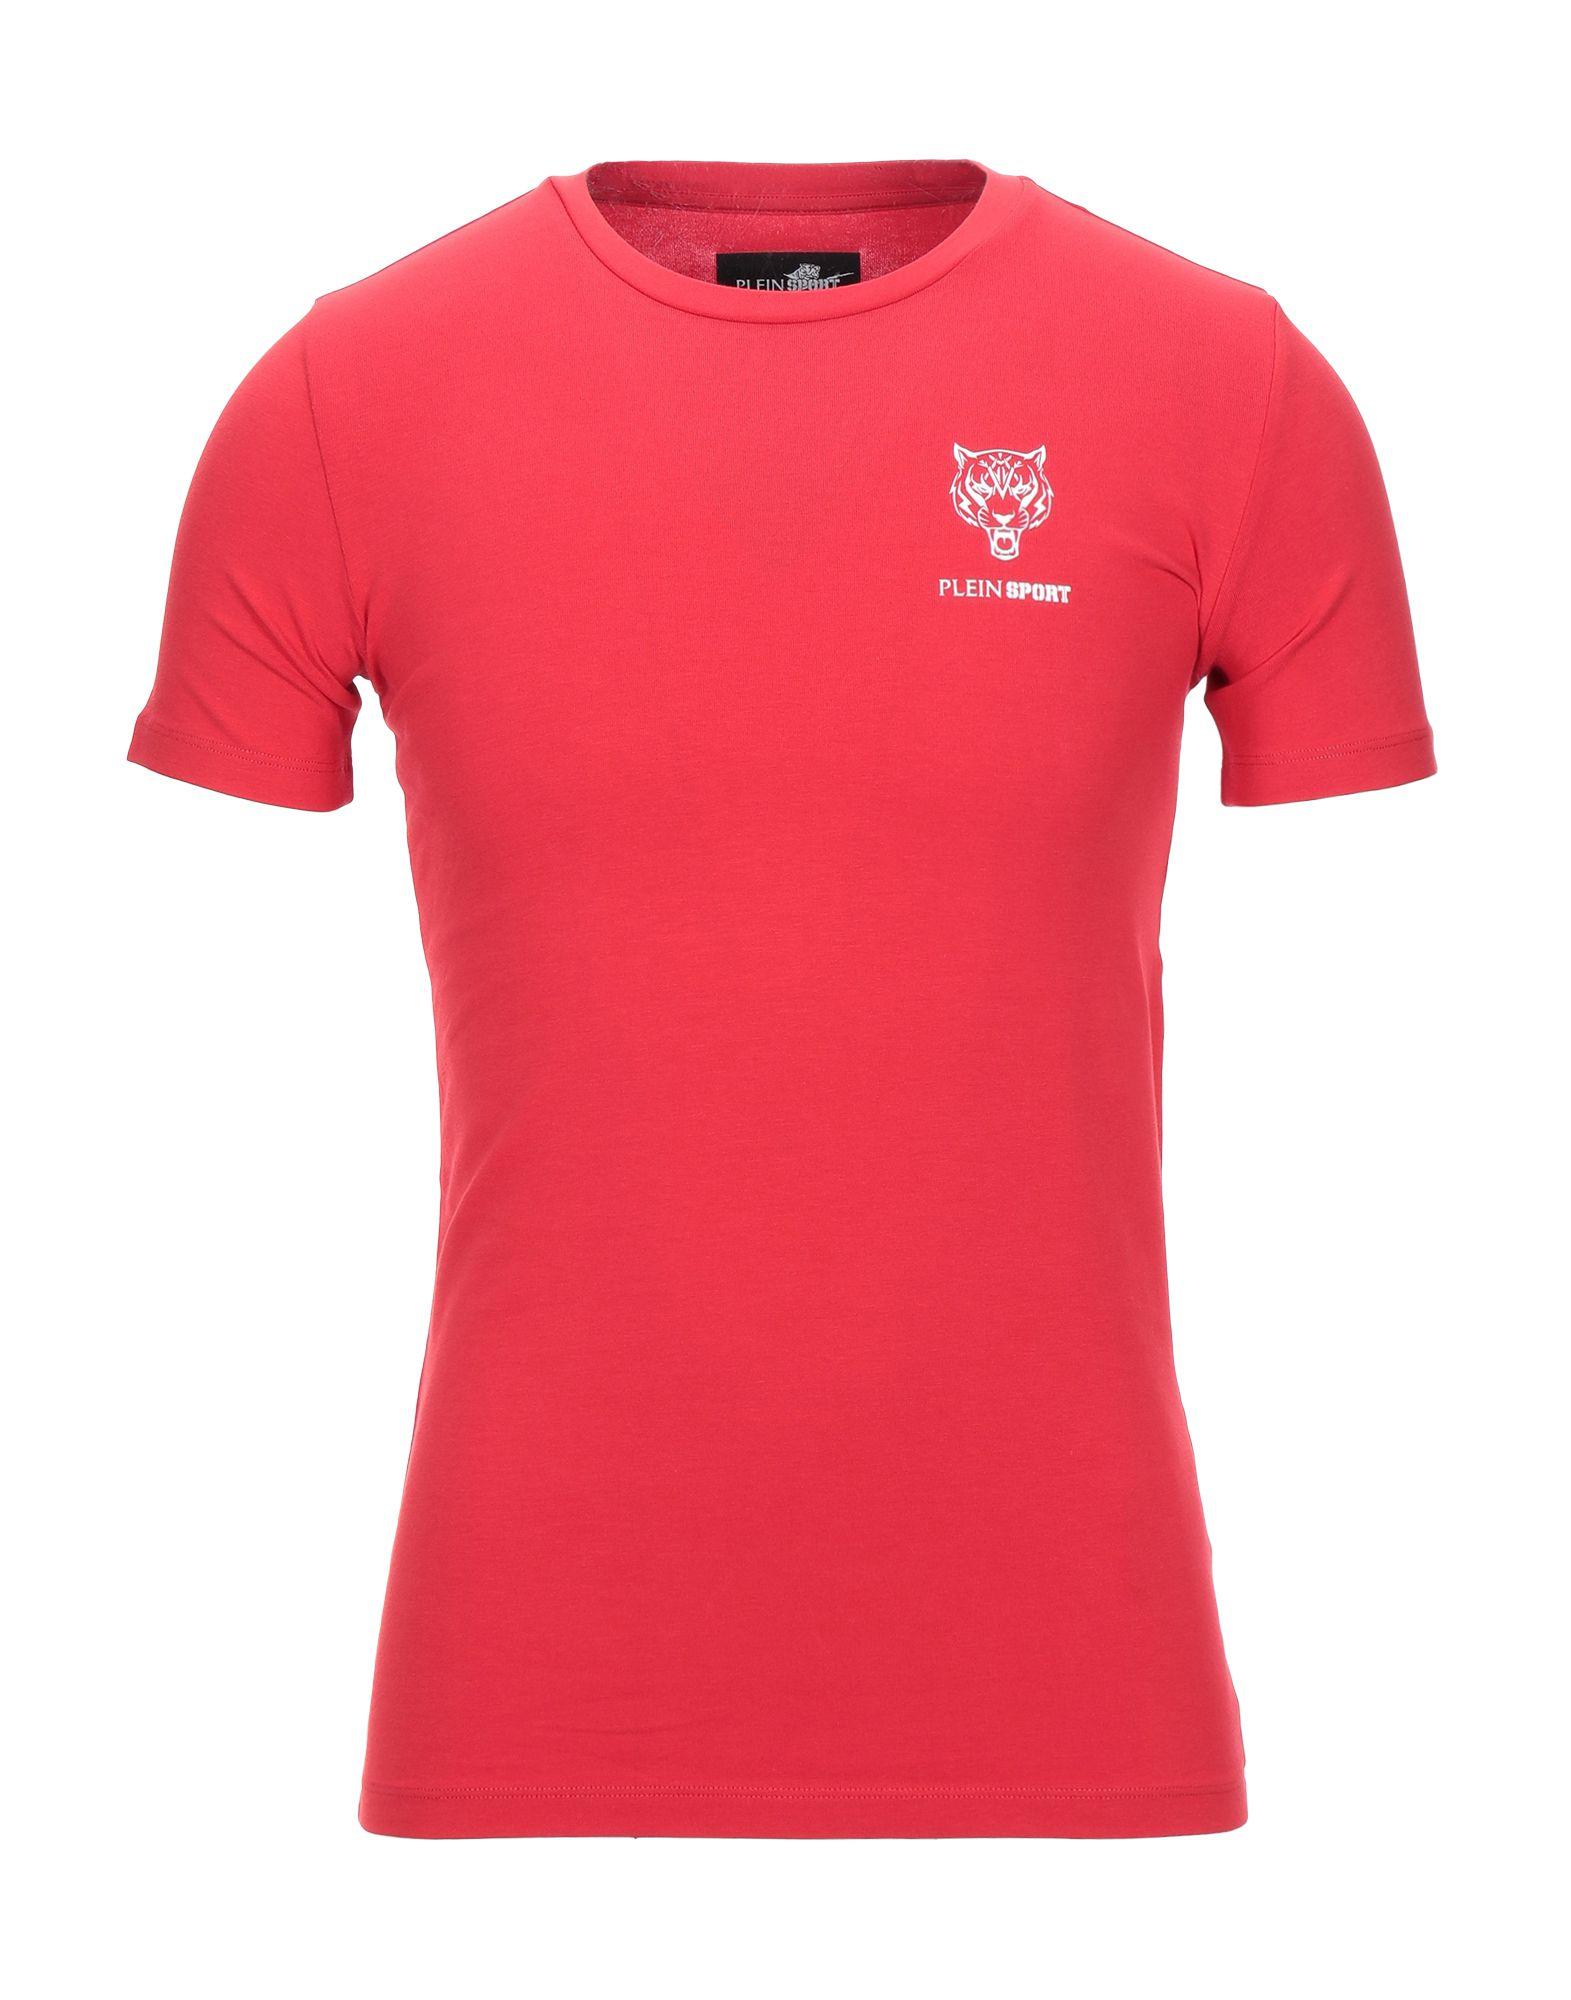 PLEIN SPORT プレイン・スポーツ メンズ T シャツ レッド - ダークブルー